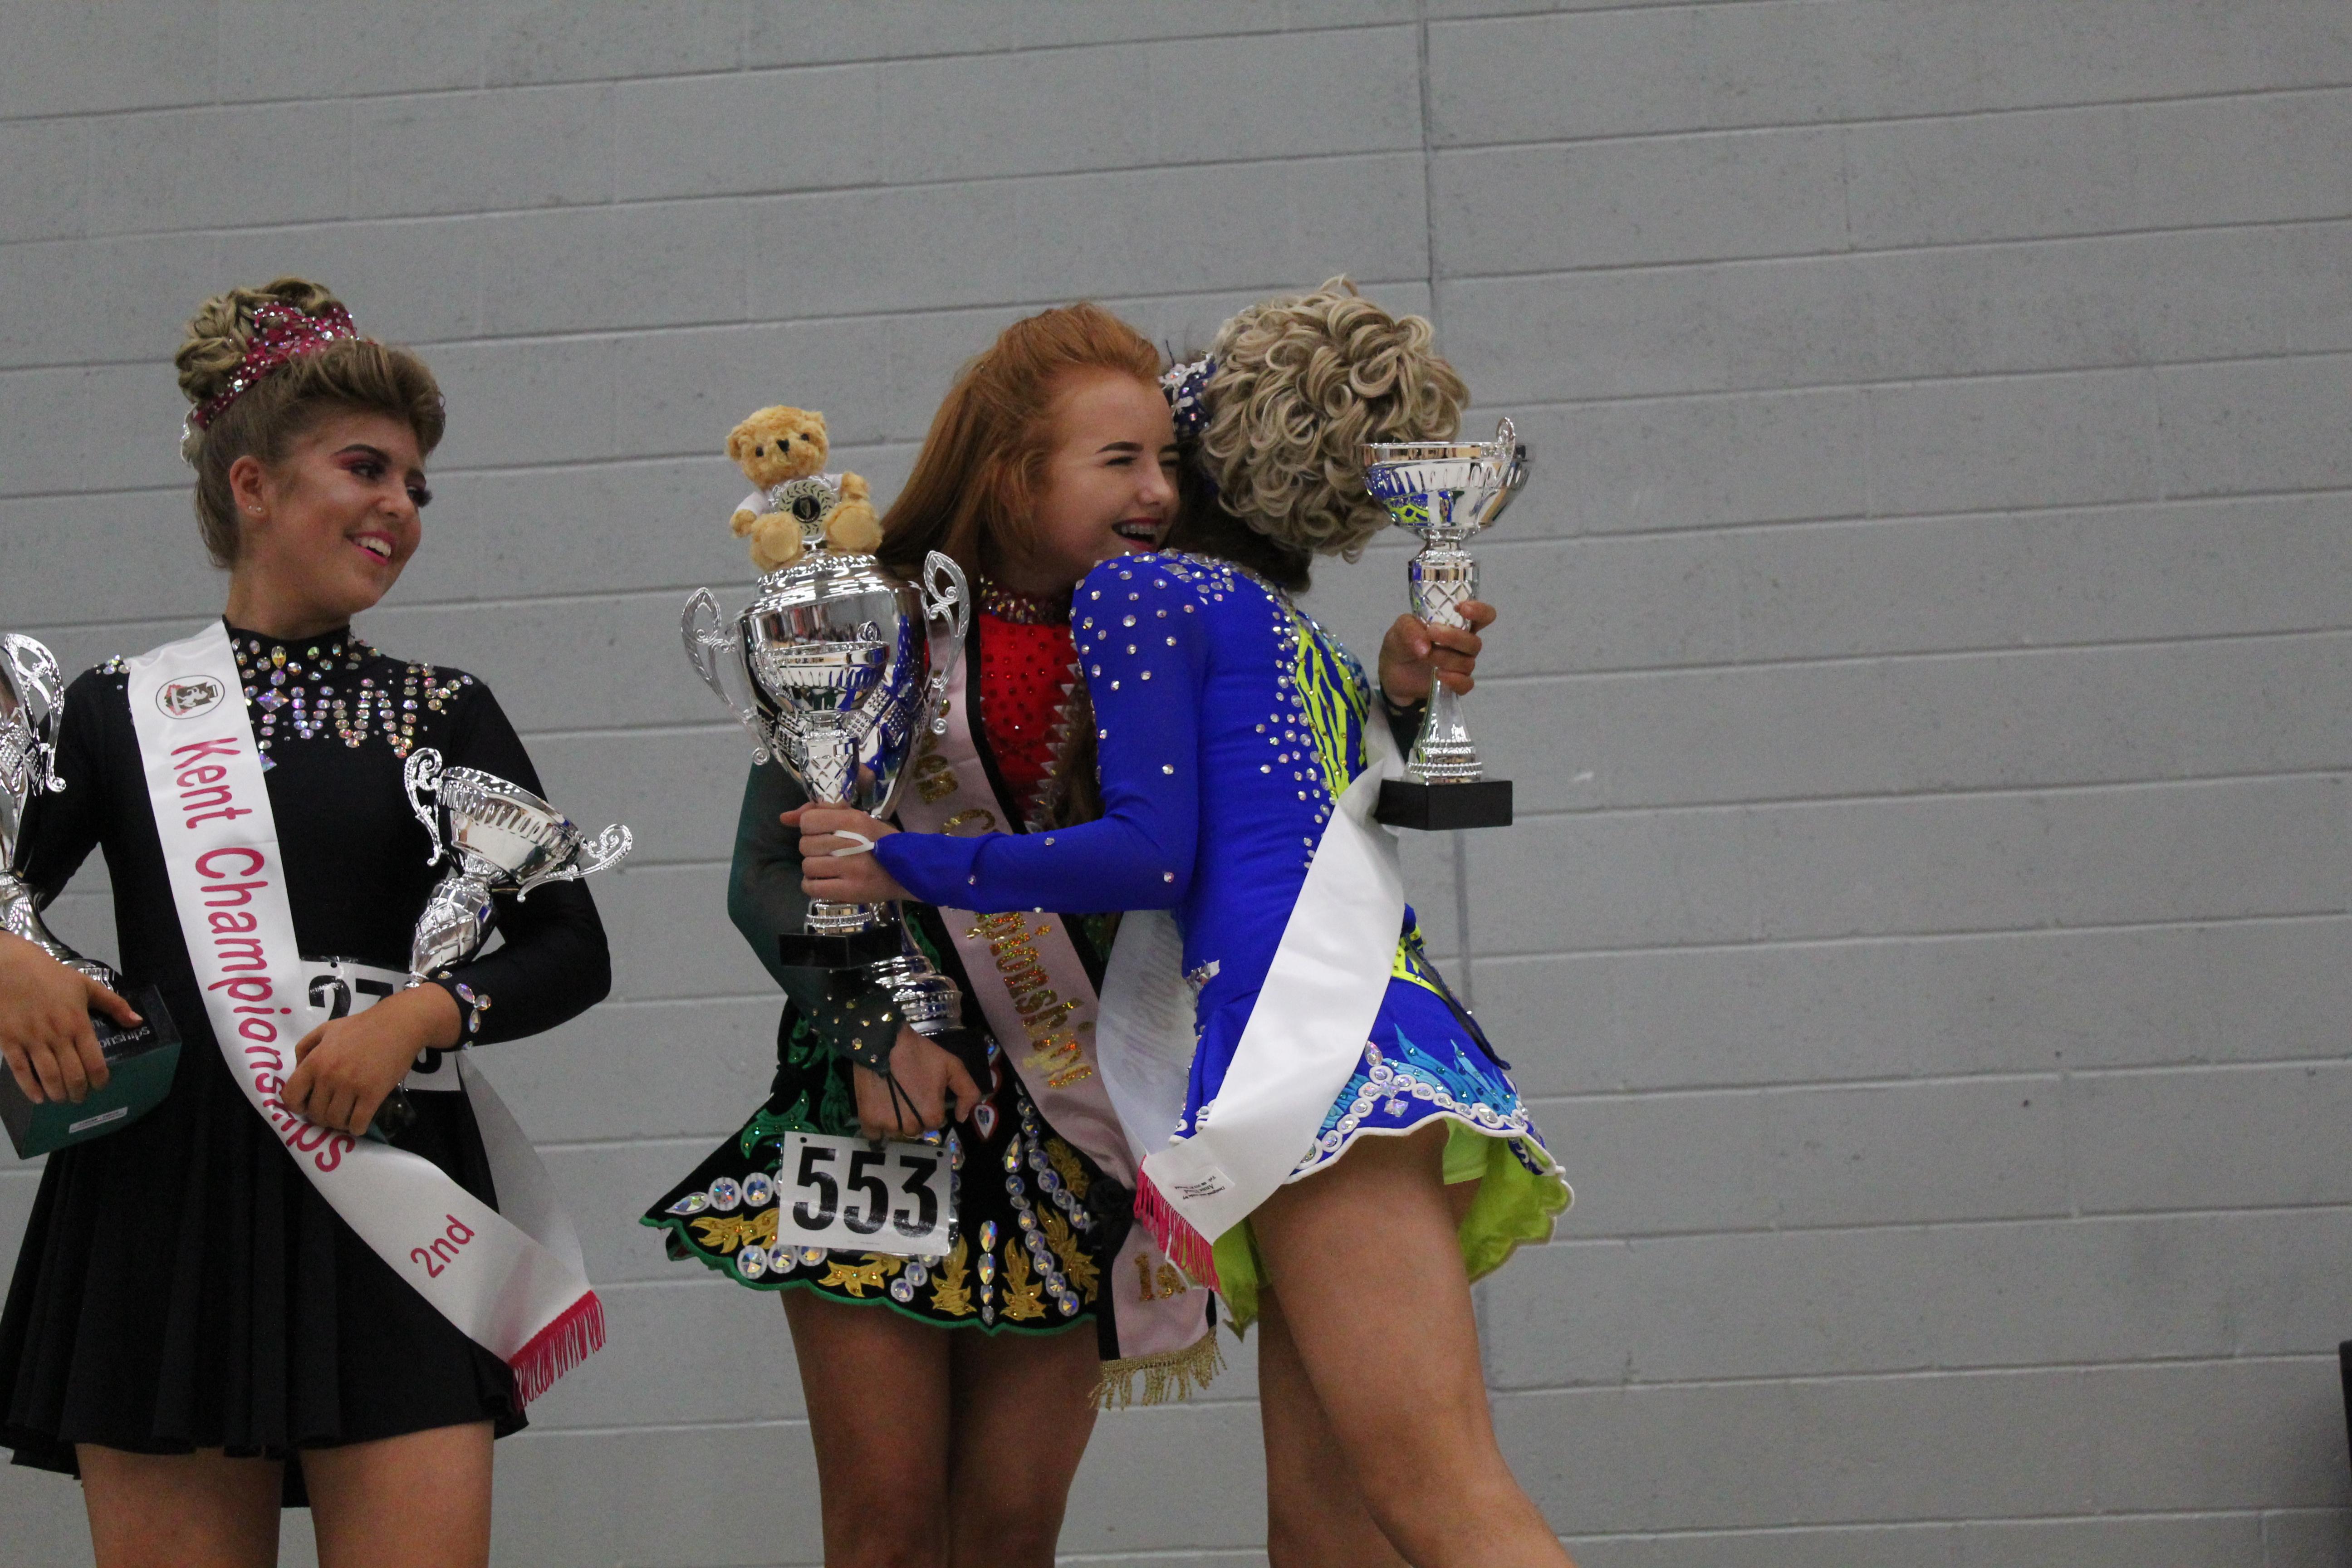 CRDM Kent Championships 2019